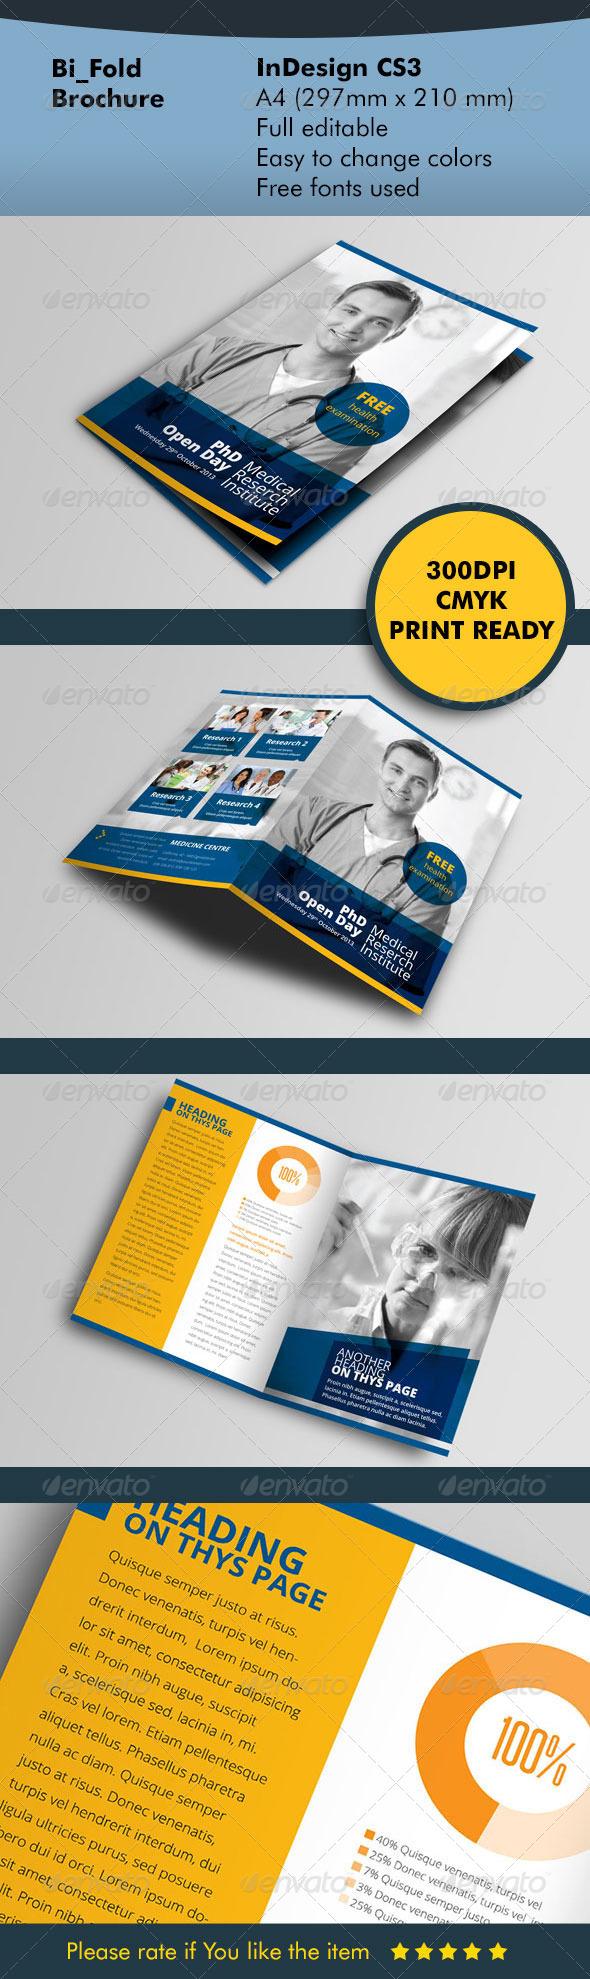 GraphicRiver BiFold Brochure Blue 5605169